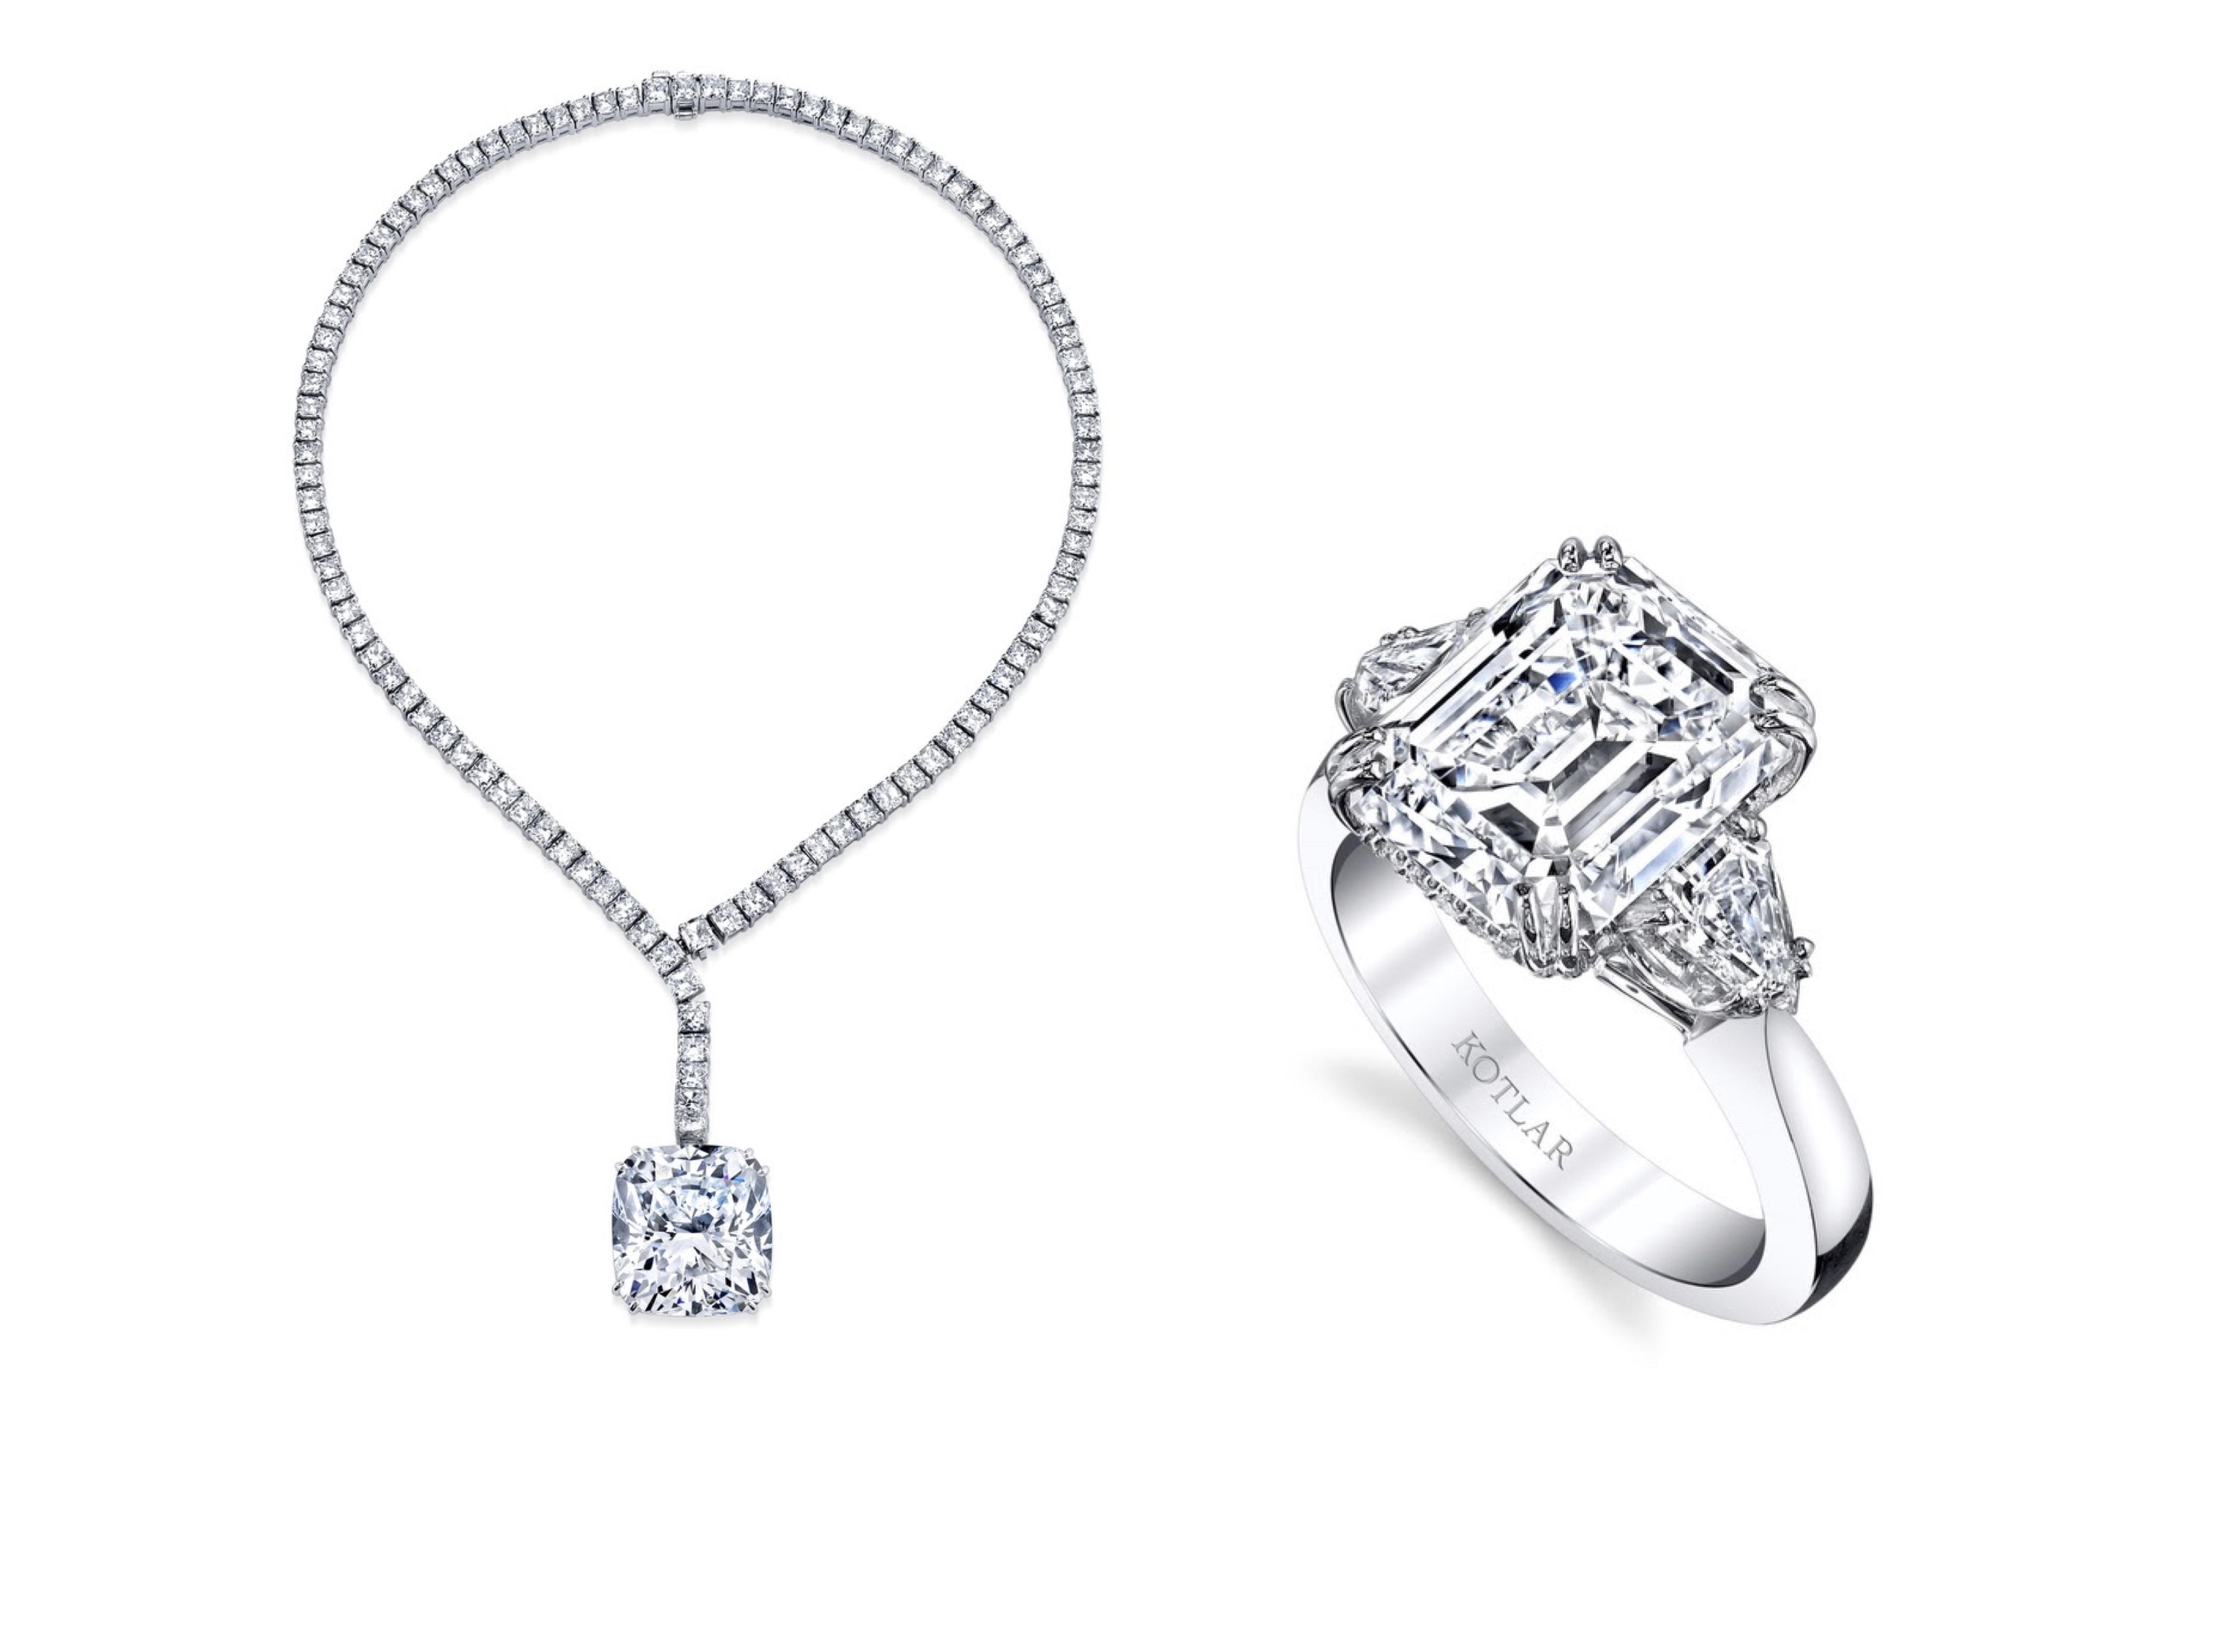 Celine Dion glitters in $25 million worth of Diamonds